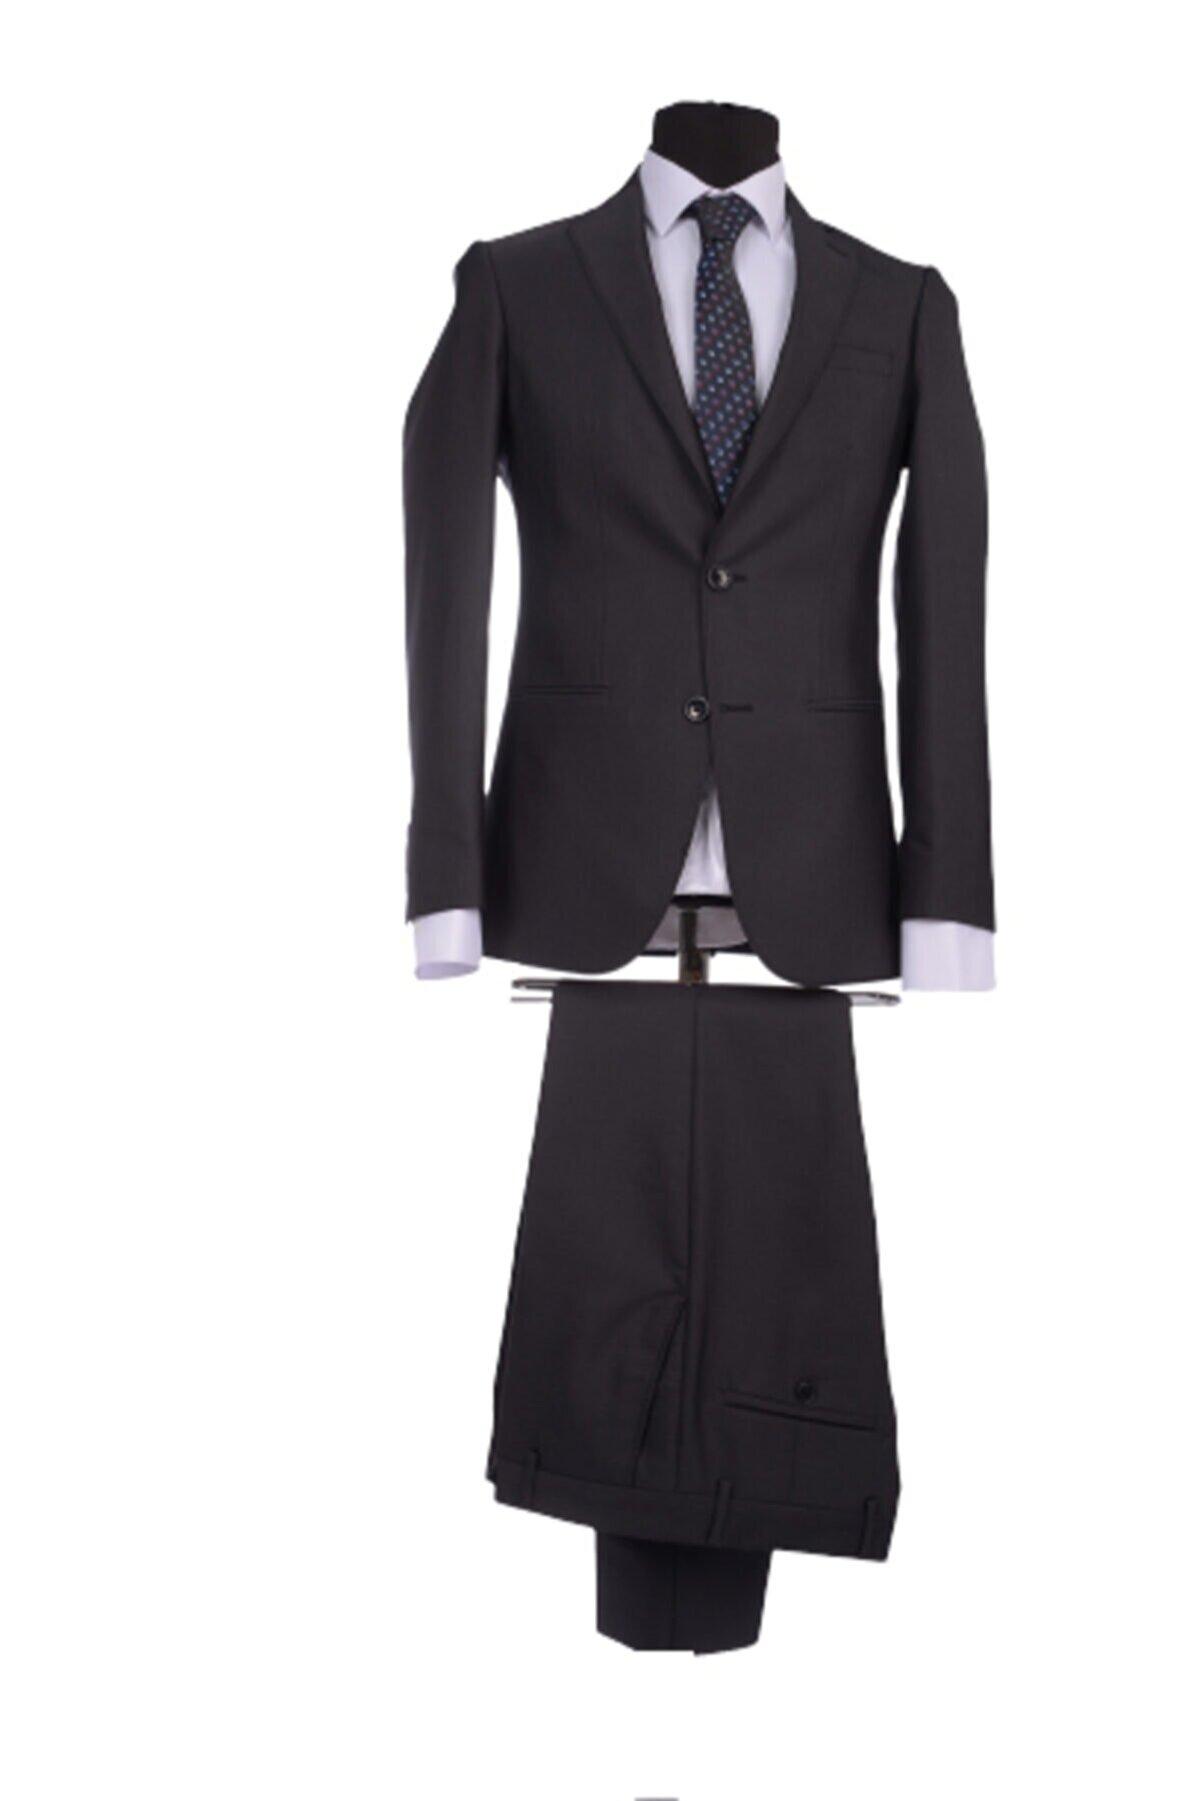 Cashmere 10200200840 19kbgm 27trs Ref1 Kalıp Puntolu Takım Elbise